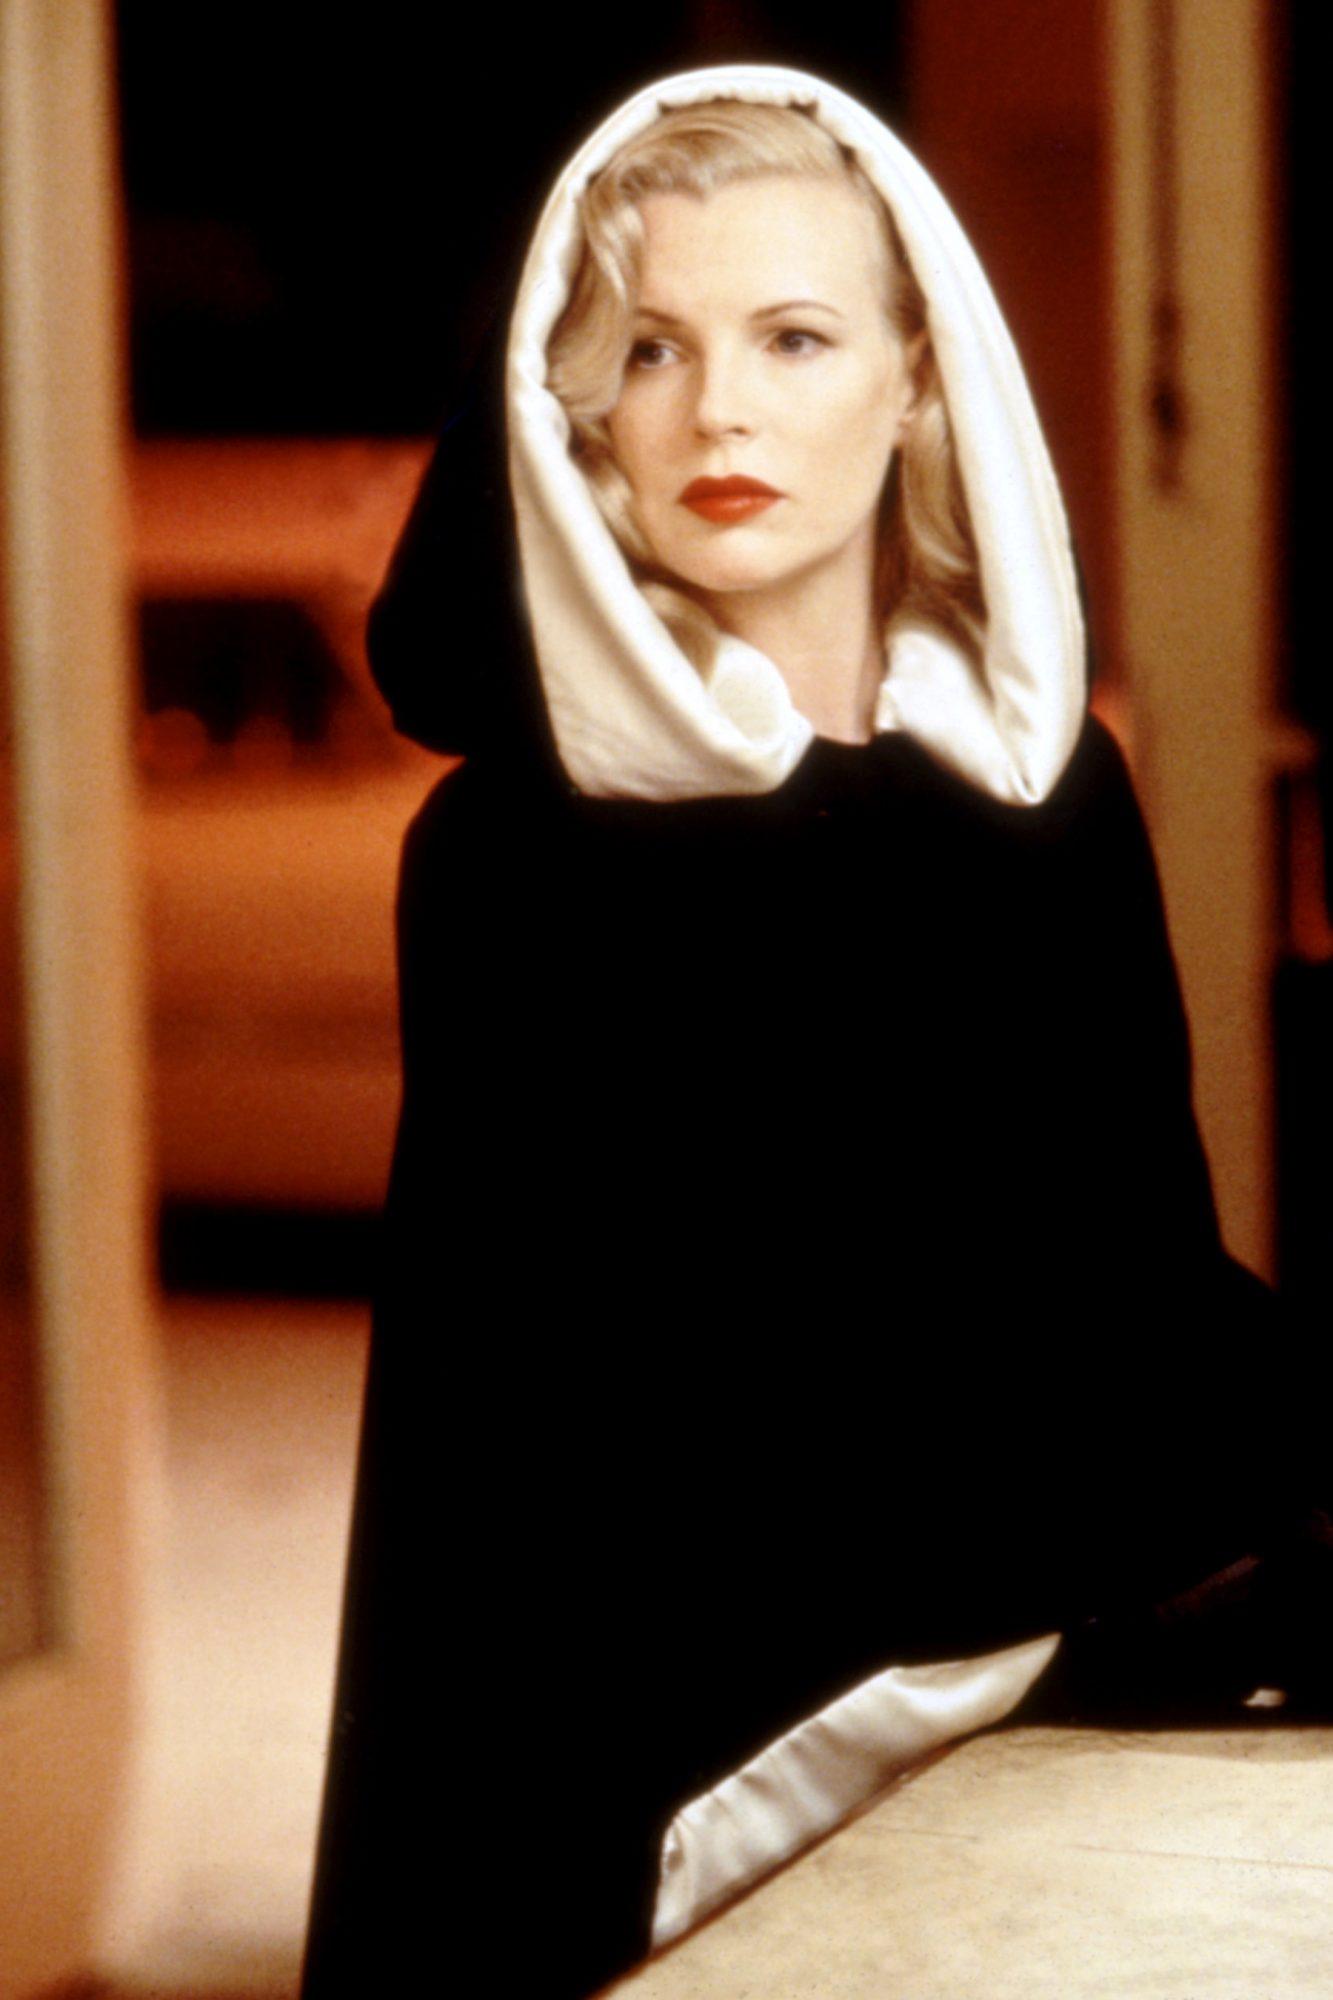 L.A. CONFIDENTIAL, Kim Basinger, 1997